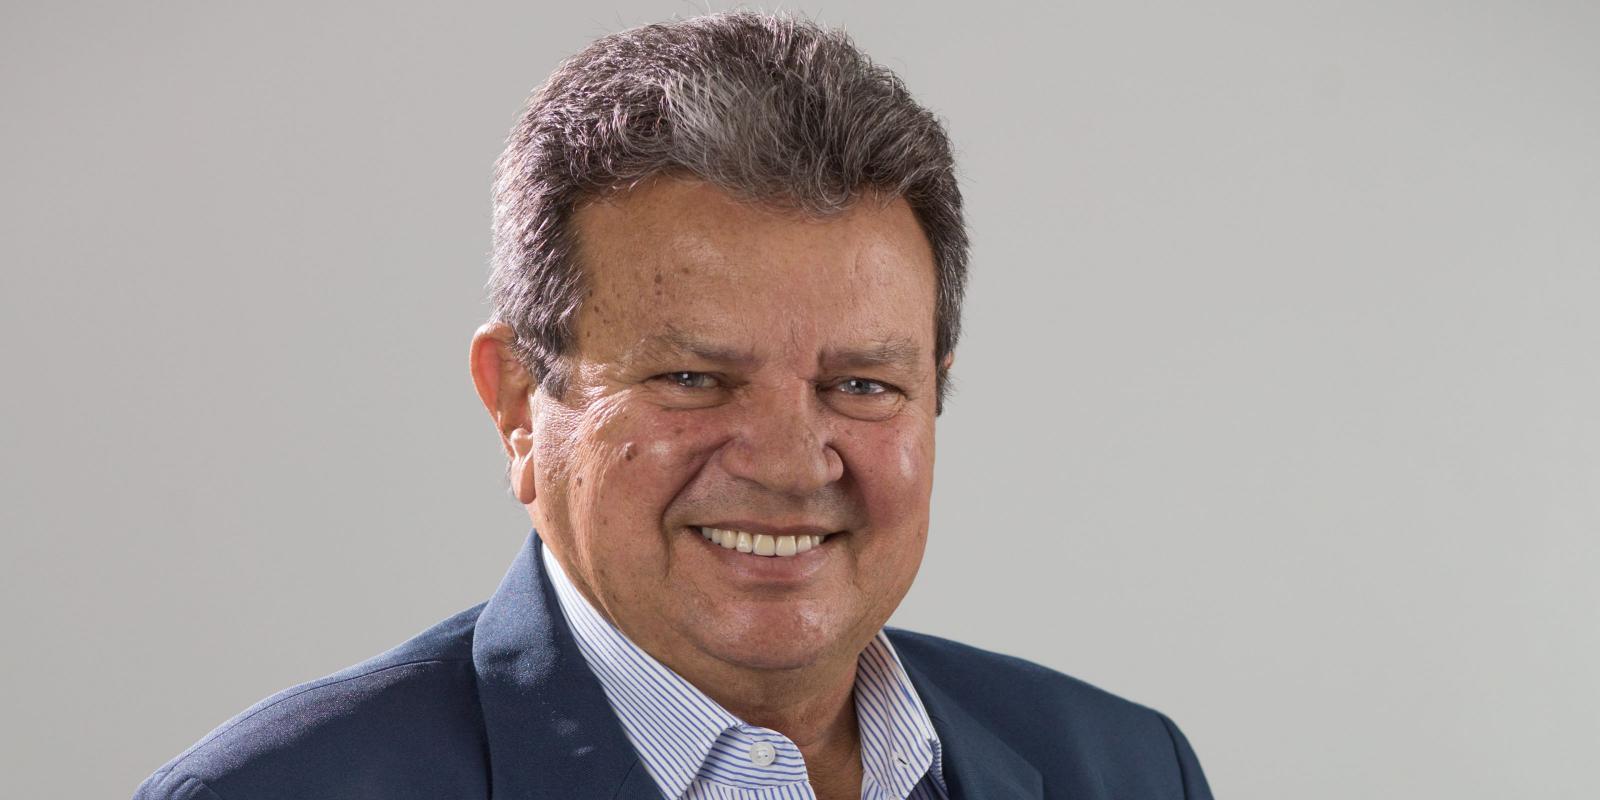 Presidente da FAEAP e SENAR-AP é eleito novo Presidente do Conselho Deliberativo do SEBRAE Amapá